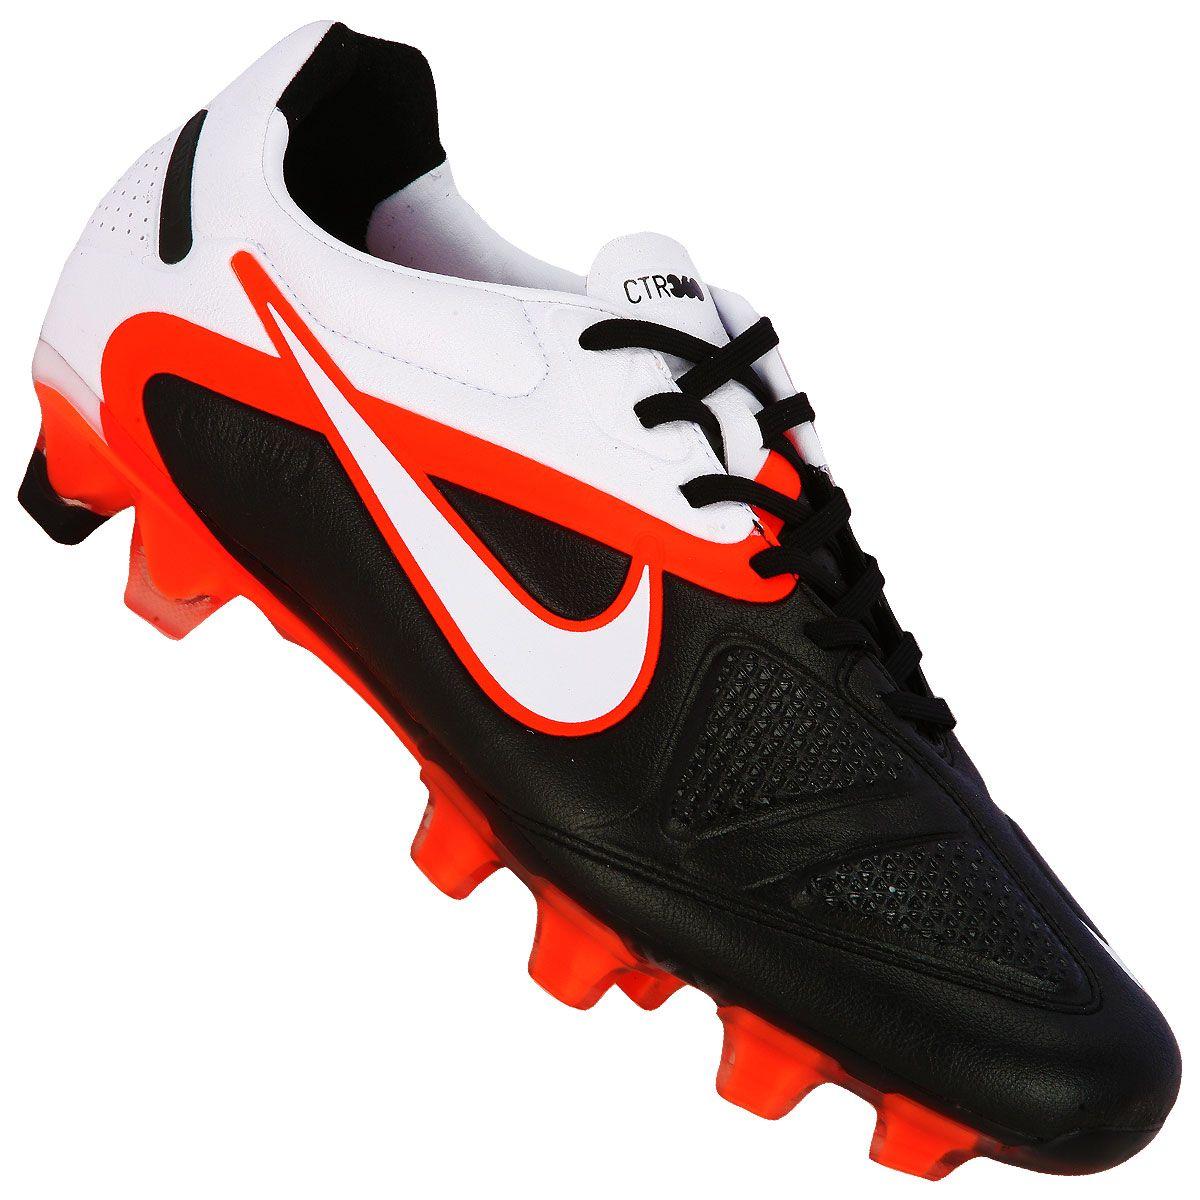 f8638dfdf0bd2 Chuteira de Campo Nike CTR 360 Maestri II FG | Shoes soccer ...